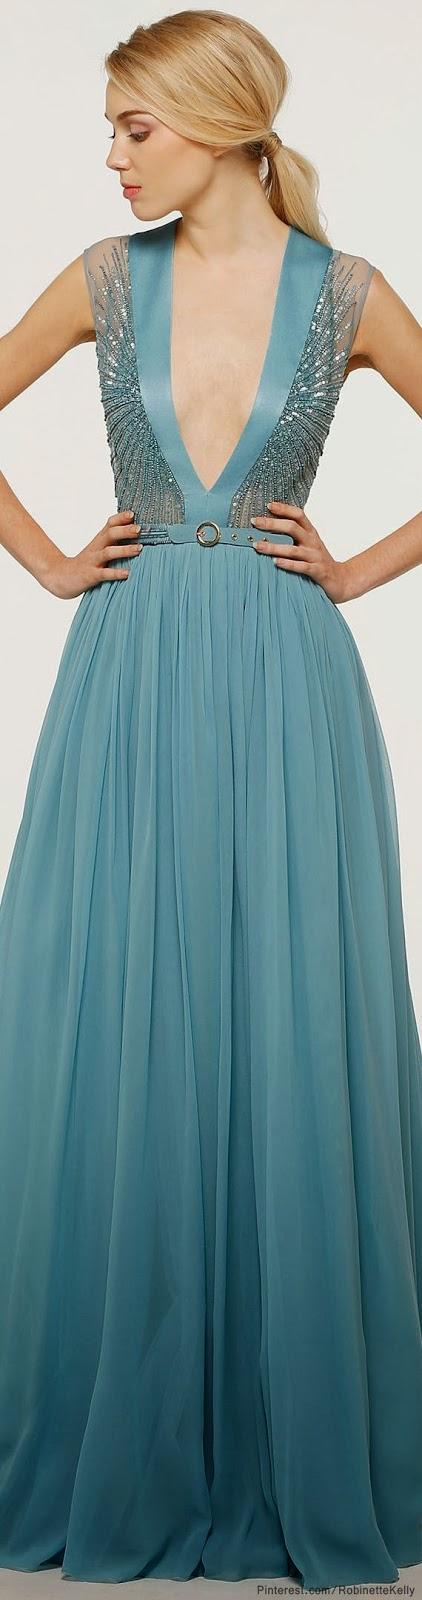 Light Blue Color Maxi Dress With Belt